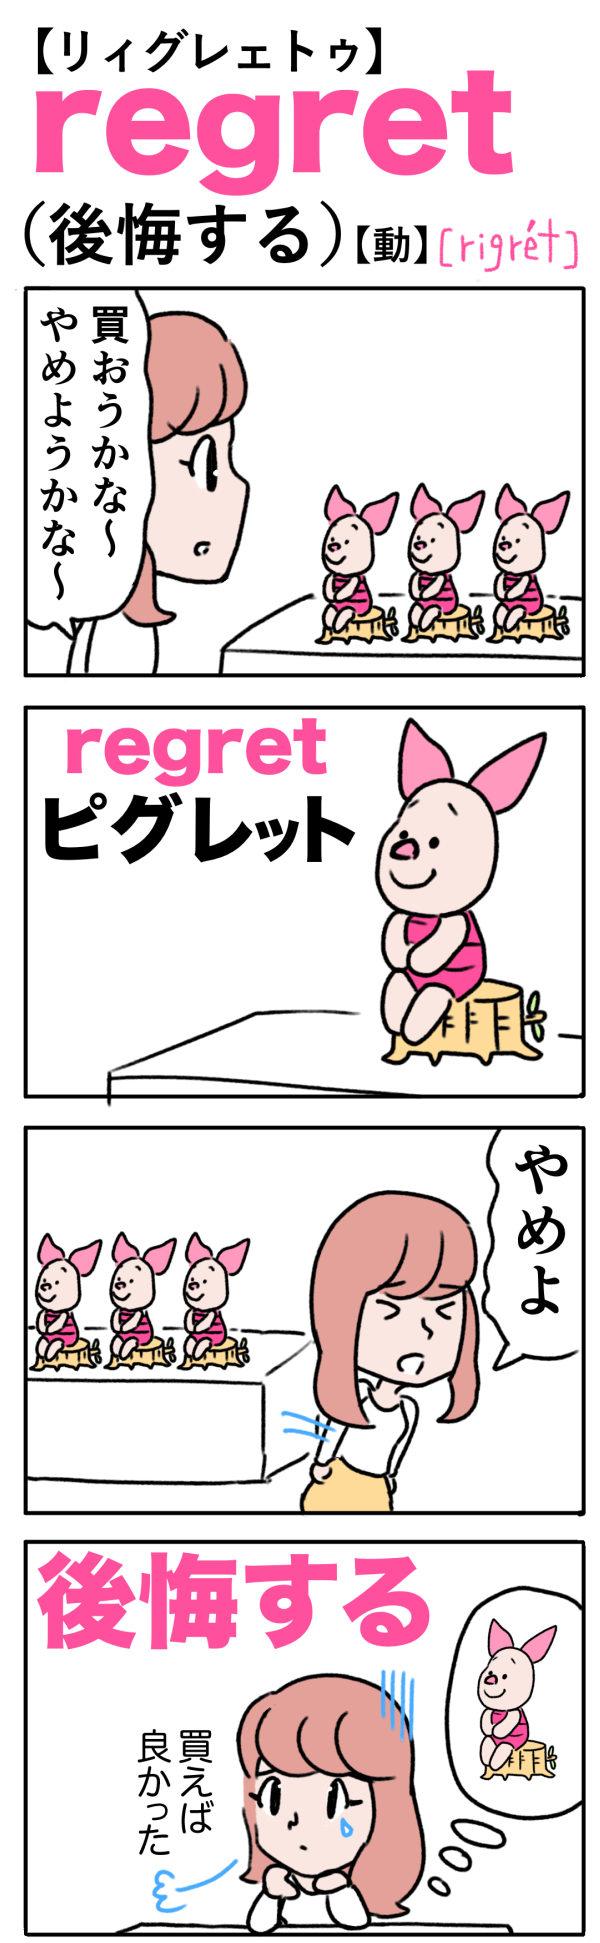 regret(後悔する)の語呂合わせ英単語